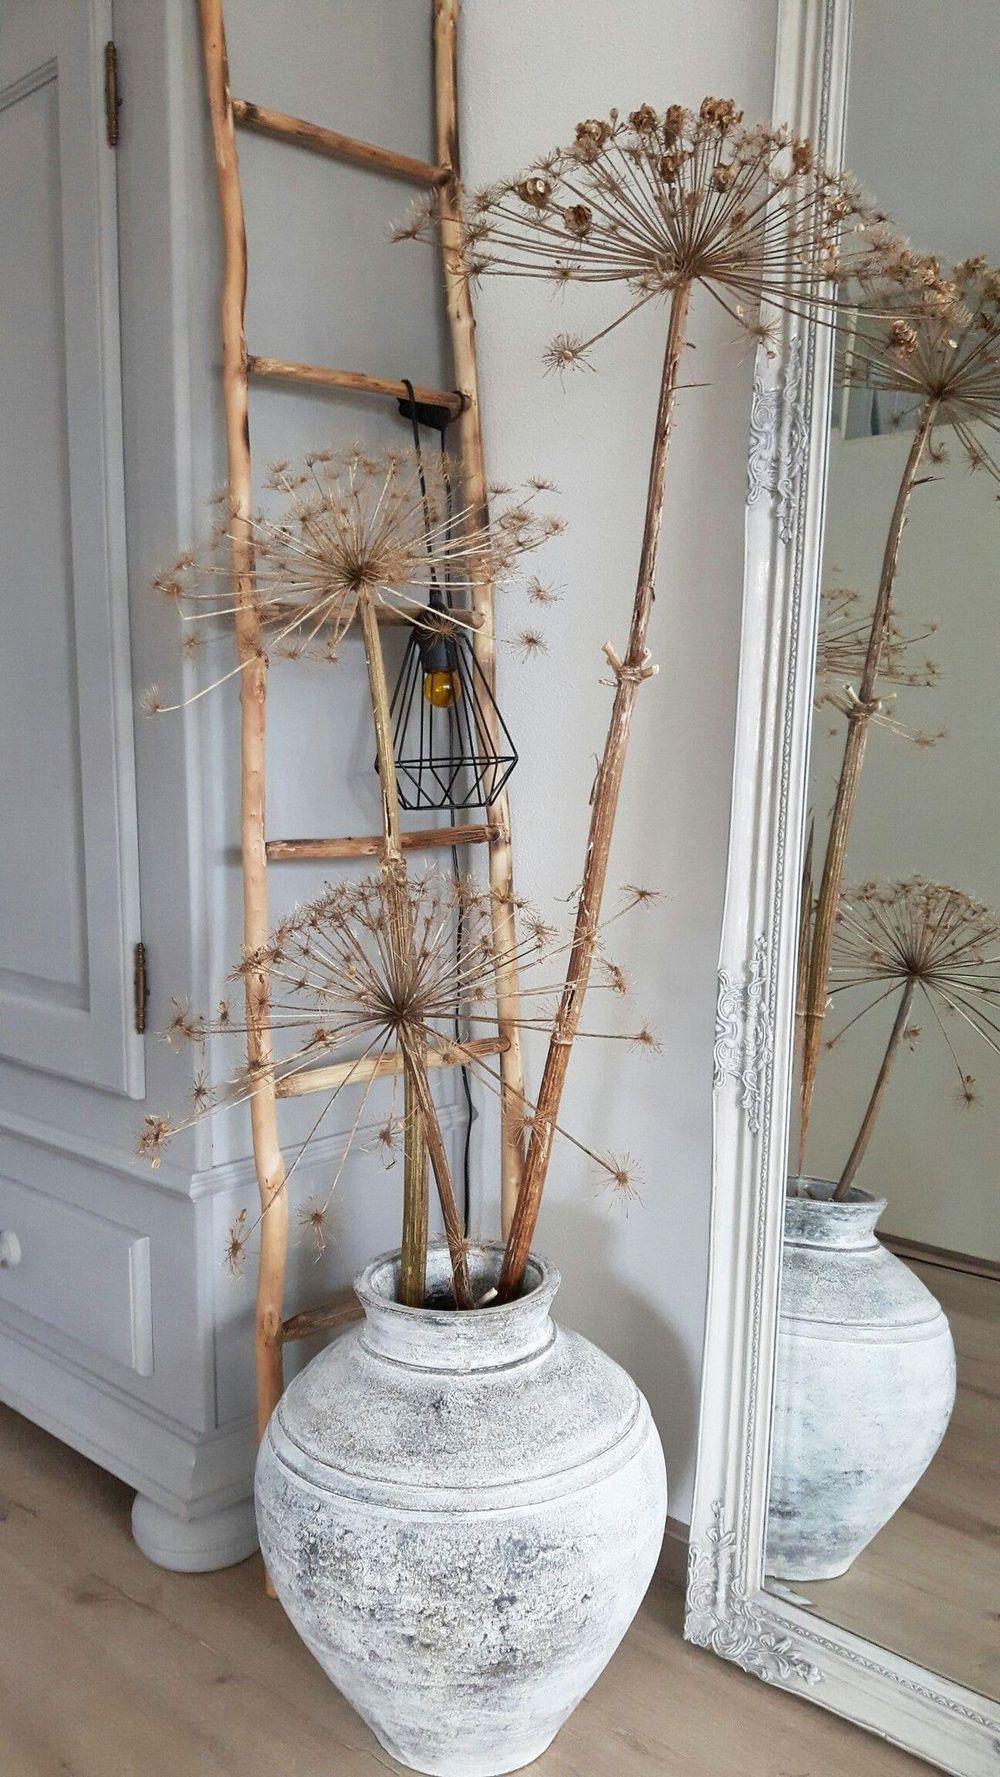 Fleurs Fanees Idees Deco Plantes Sechees Idee Deco Deco Deco Interieure